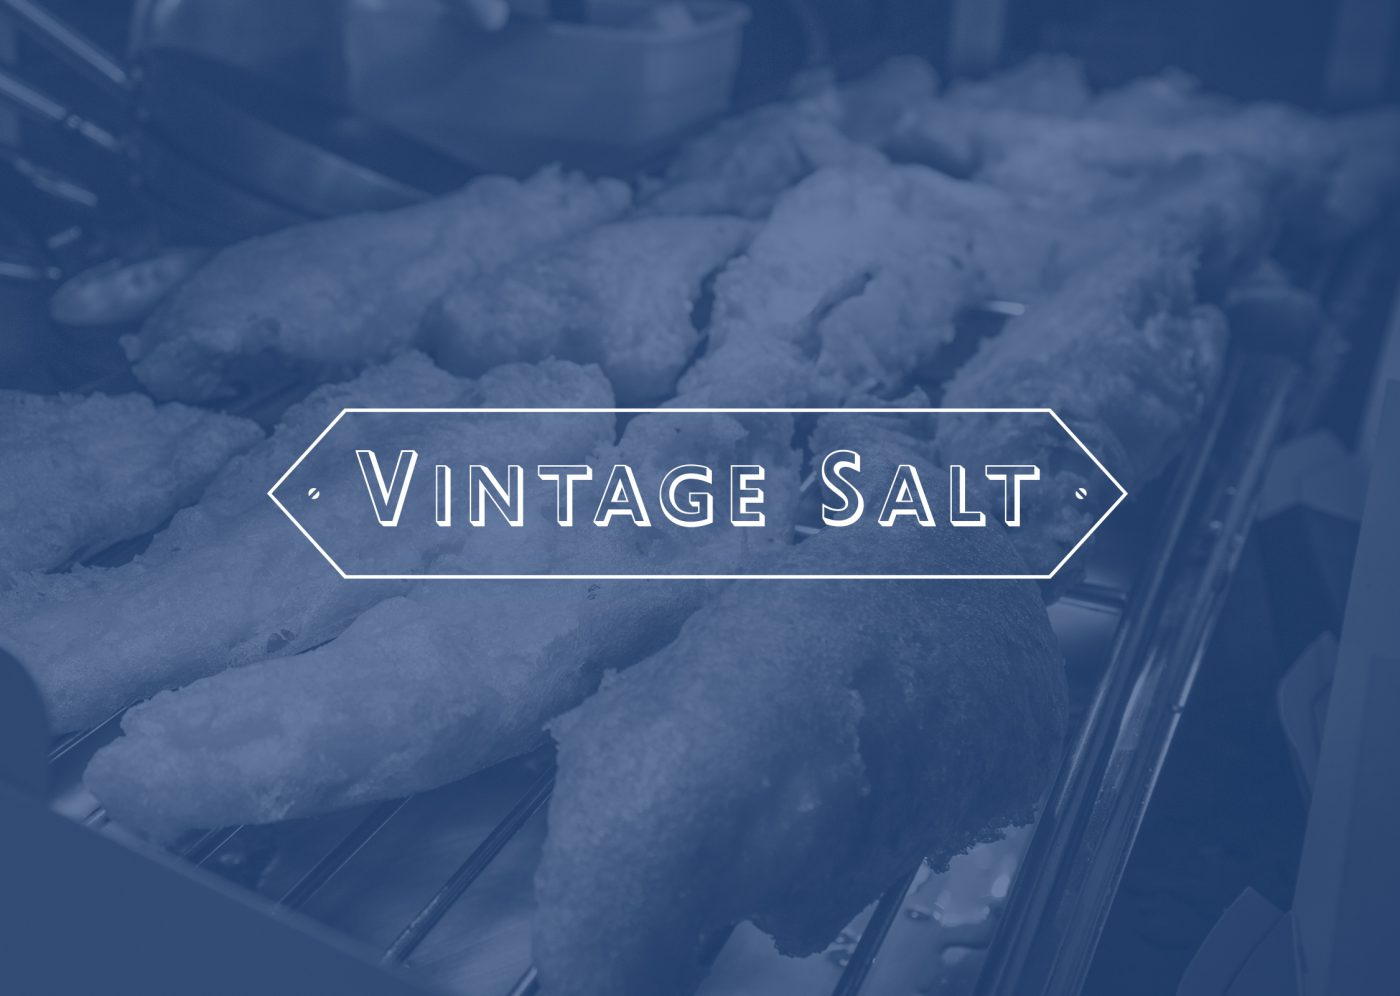 vintagesalt-logo